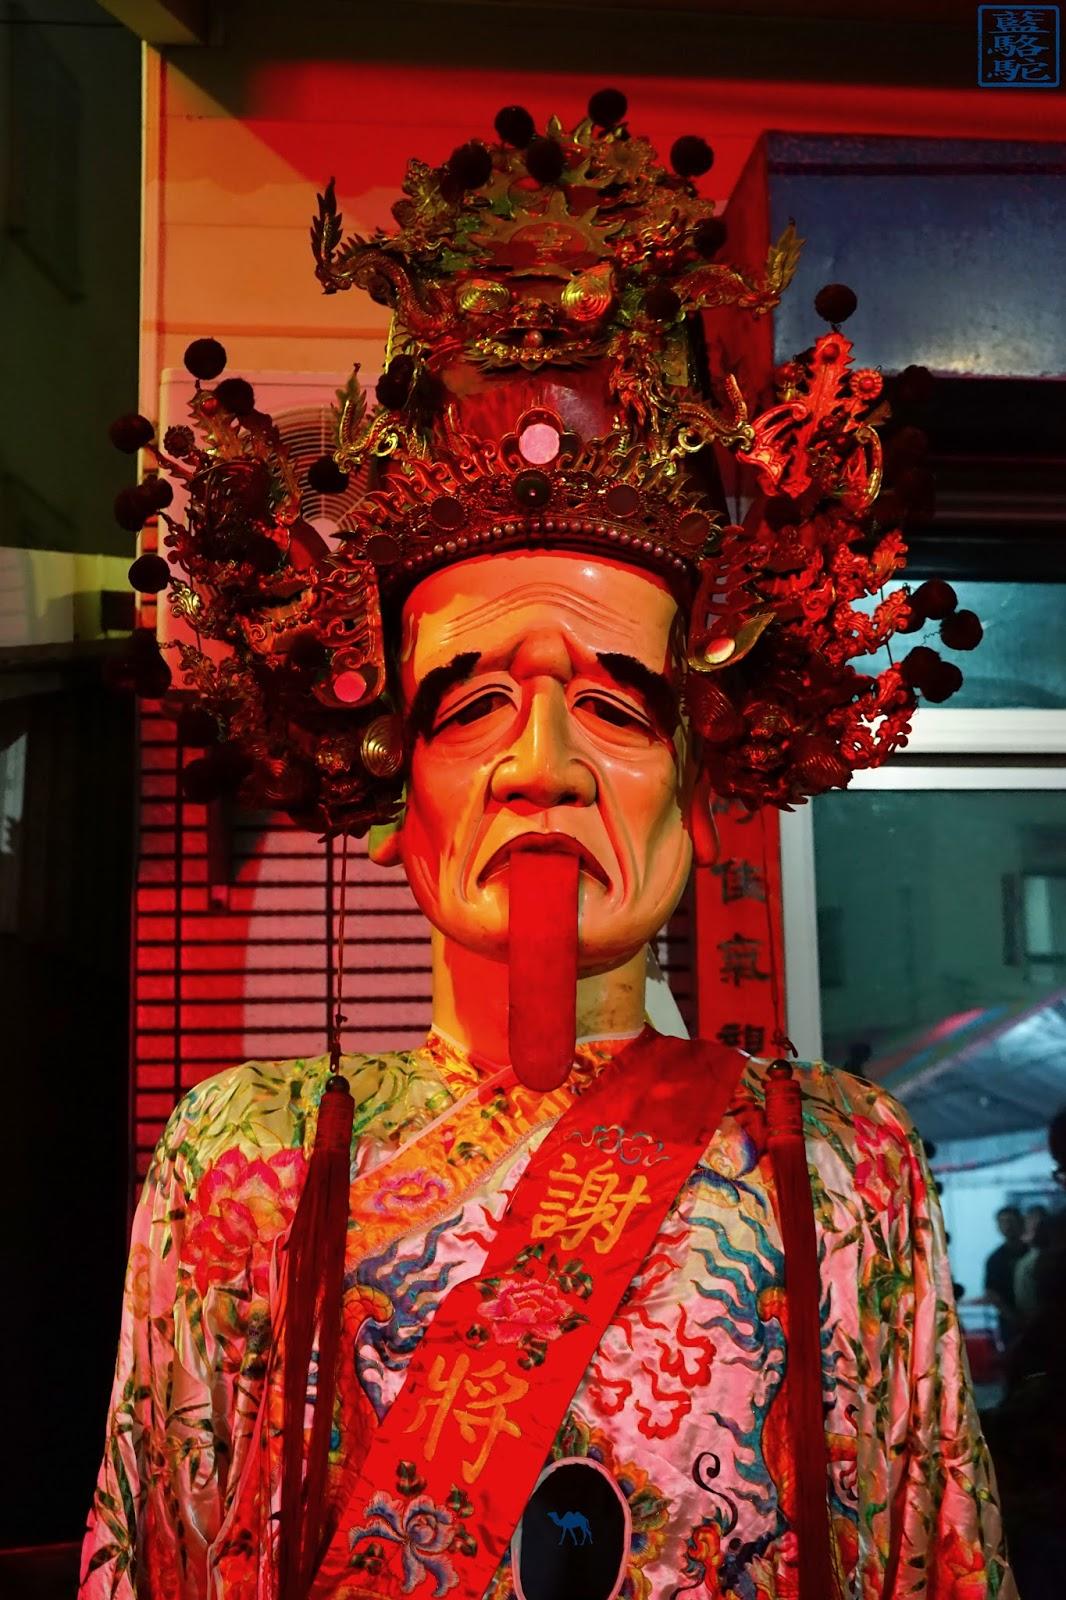 Le Chameau Bleu- Blog Voyage Taitung Taiwan - Taitung -Fête de TuDiGong - Tradition de Taiwan